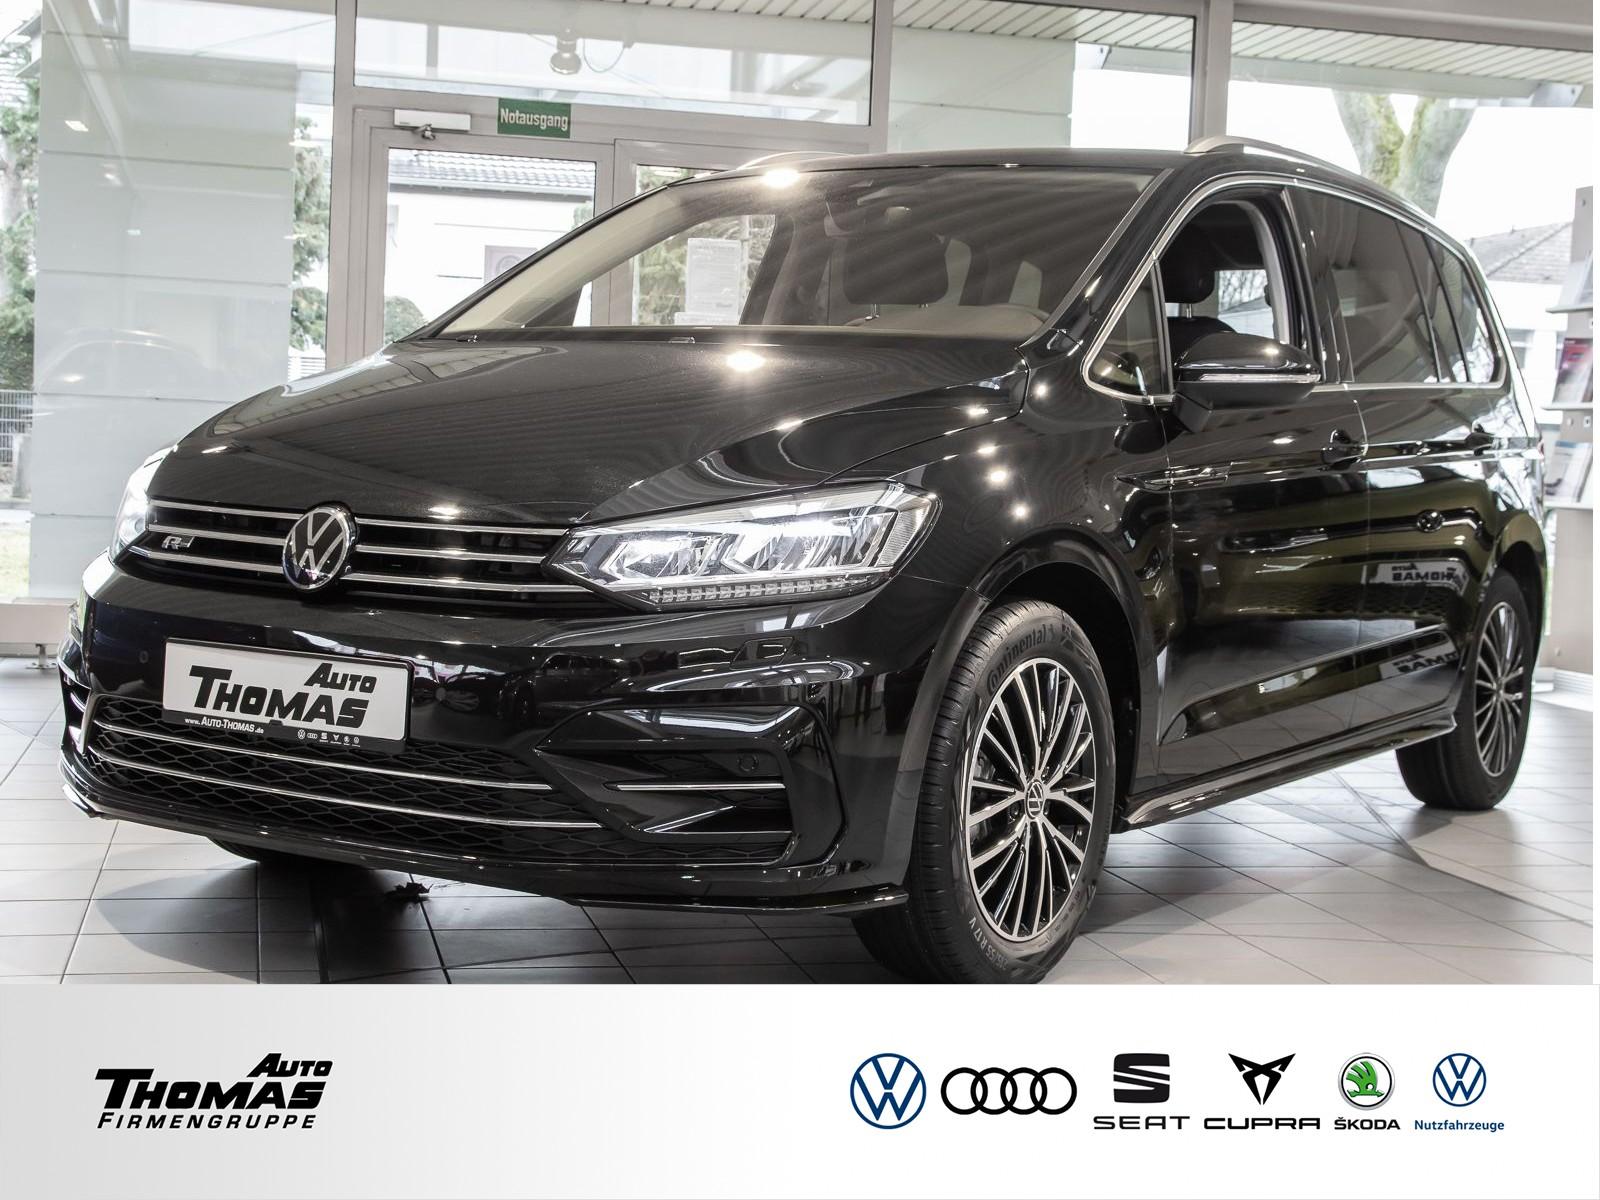 Volkswagen Touran R-Line Comfortline 1,5 l TSI+DSG+Rear View, Jahr 2021, Benzin